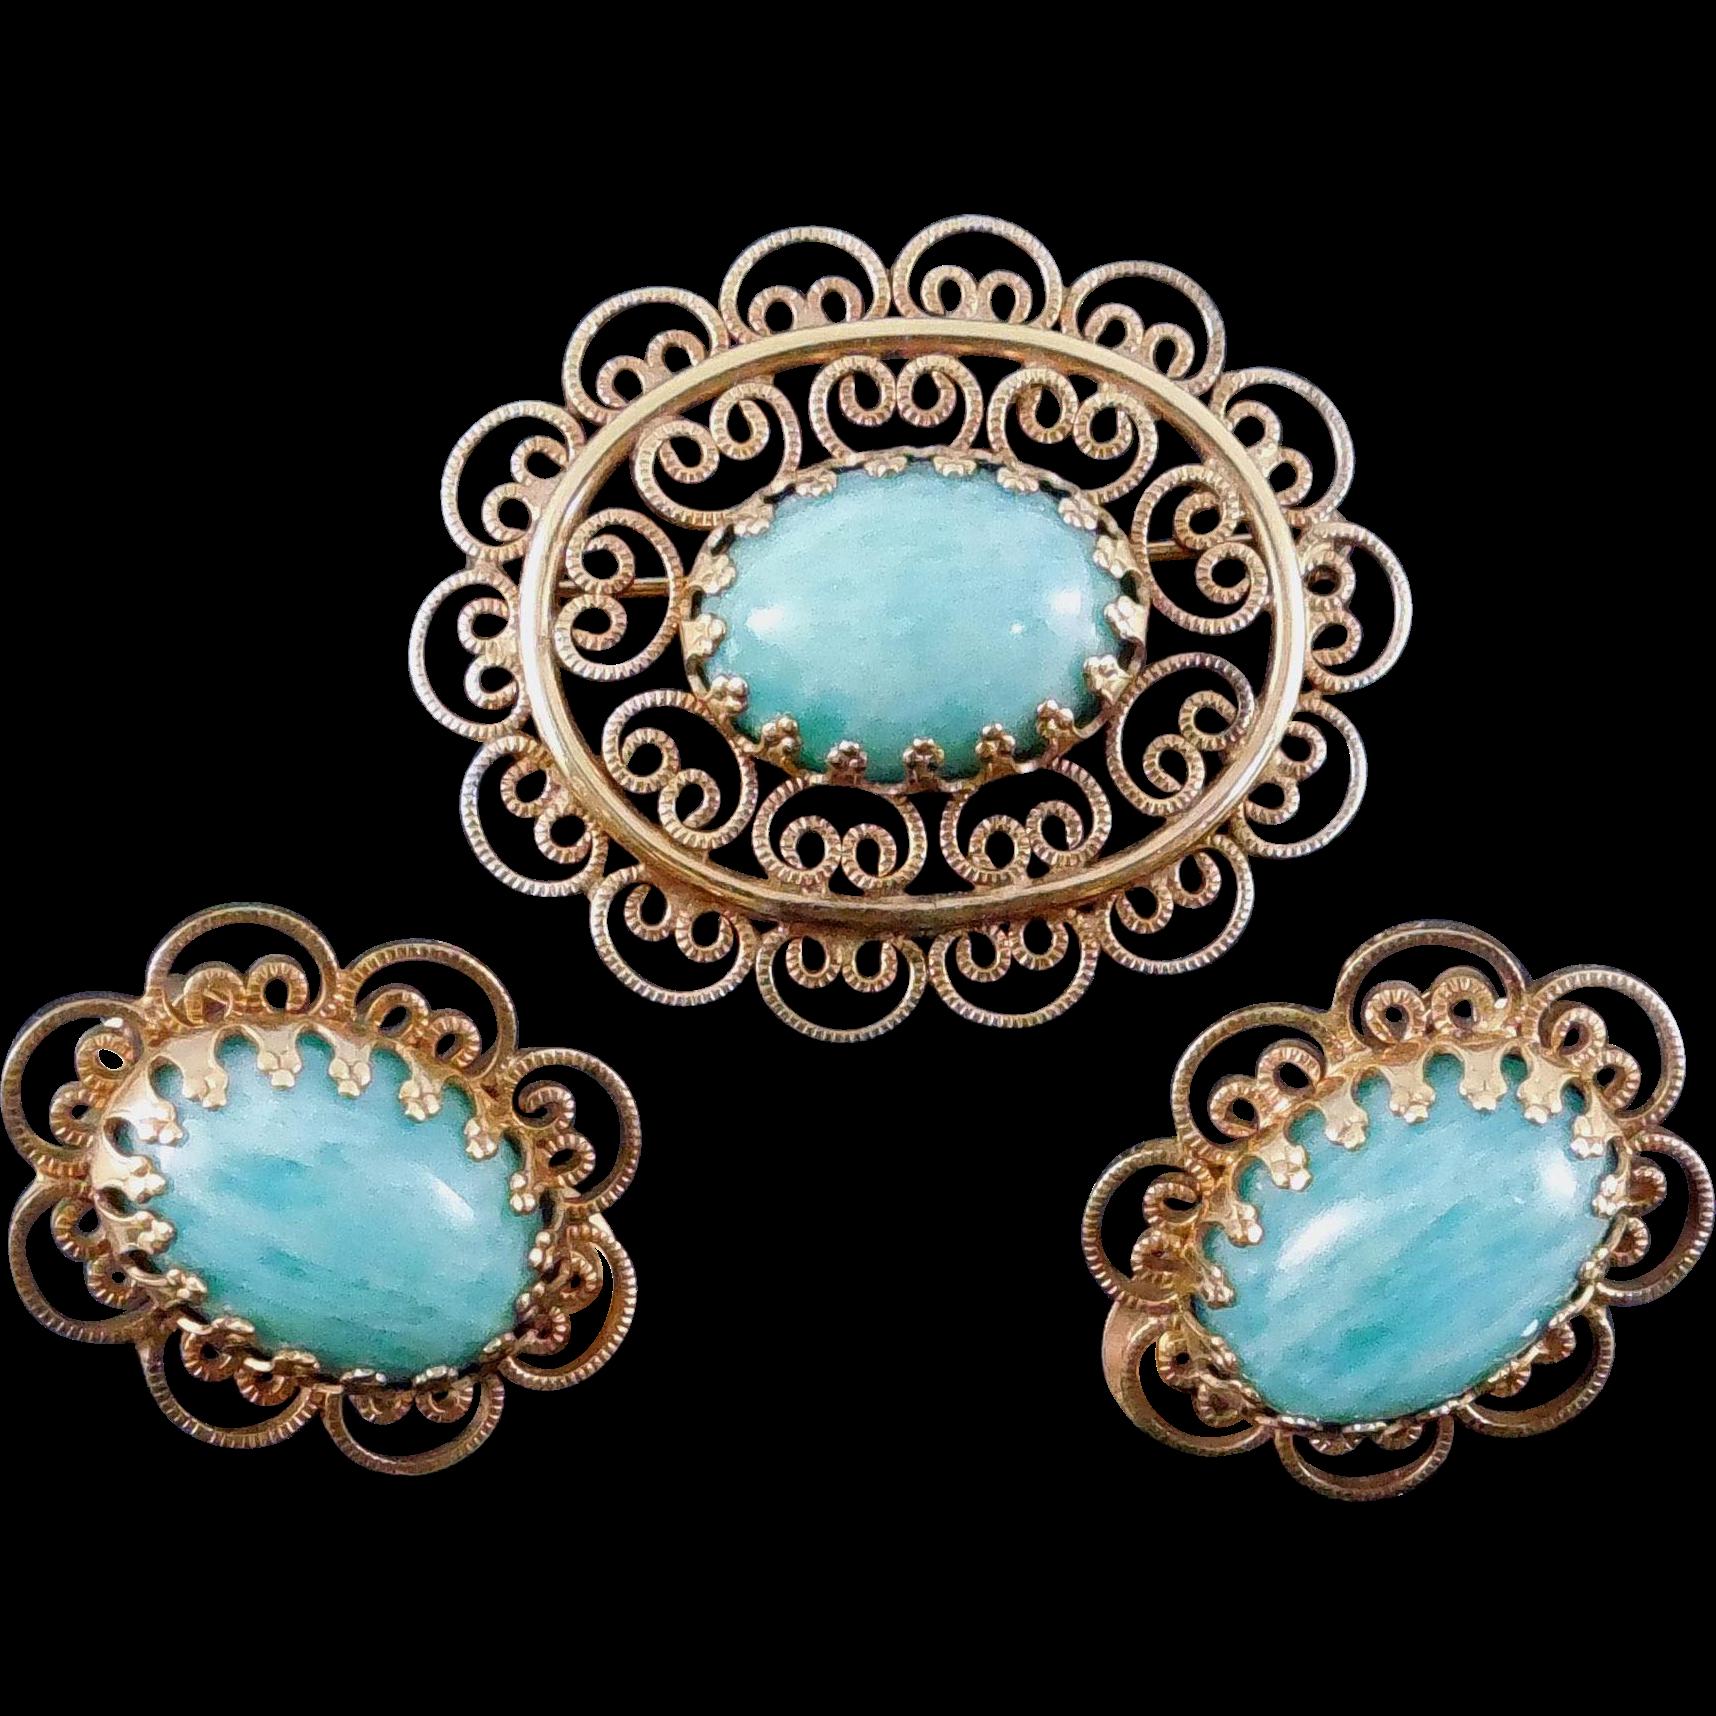 Signed Winard Brooch & Earrings Set 12K GF With Mottled Green Glass or Stone